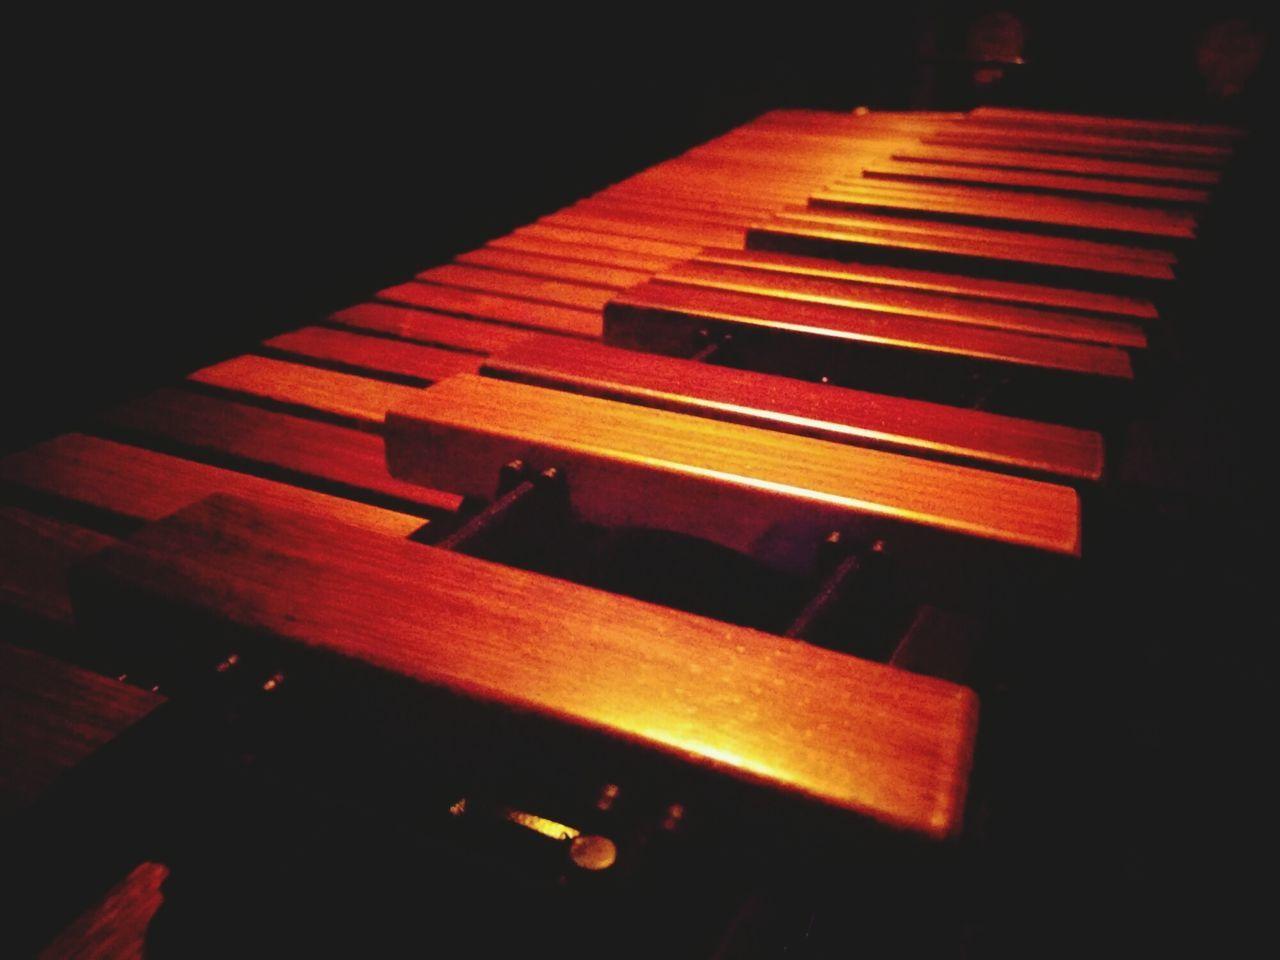 Musical Instrument Traveling Taking Photos Open Edit Making Music